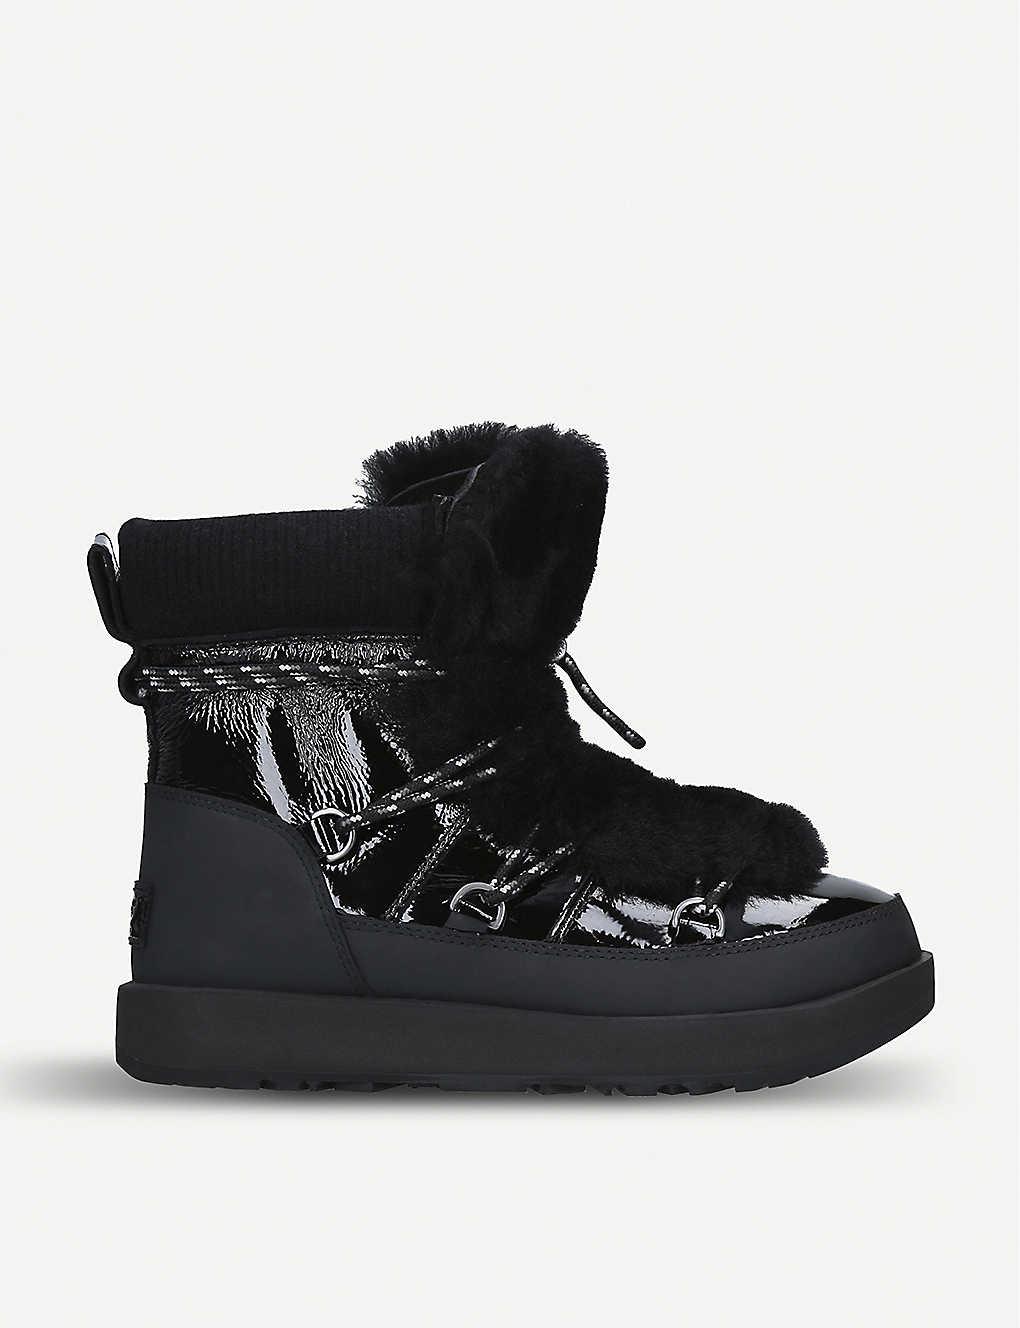 ad1800bce07 UGG - Highland waterproof leather and sheepskin boots | Selfridges.com